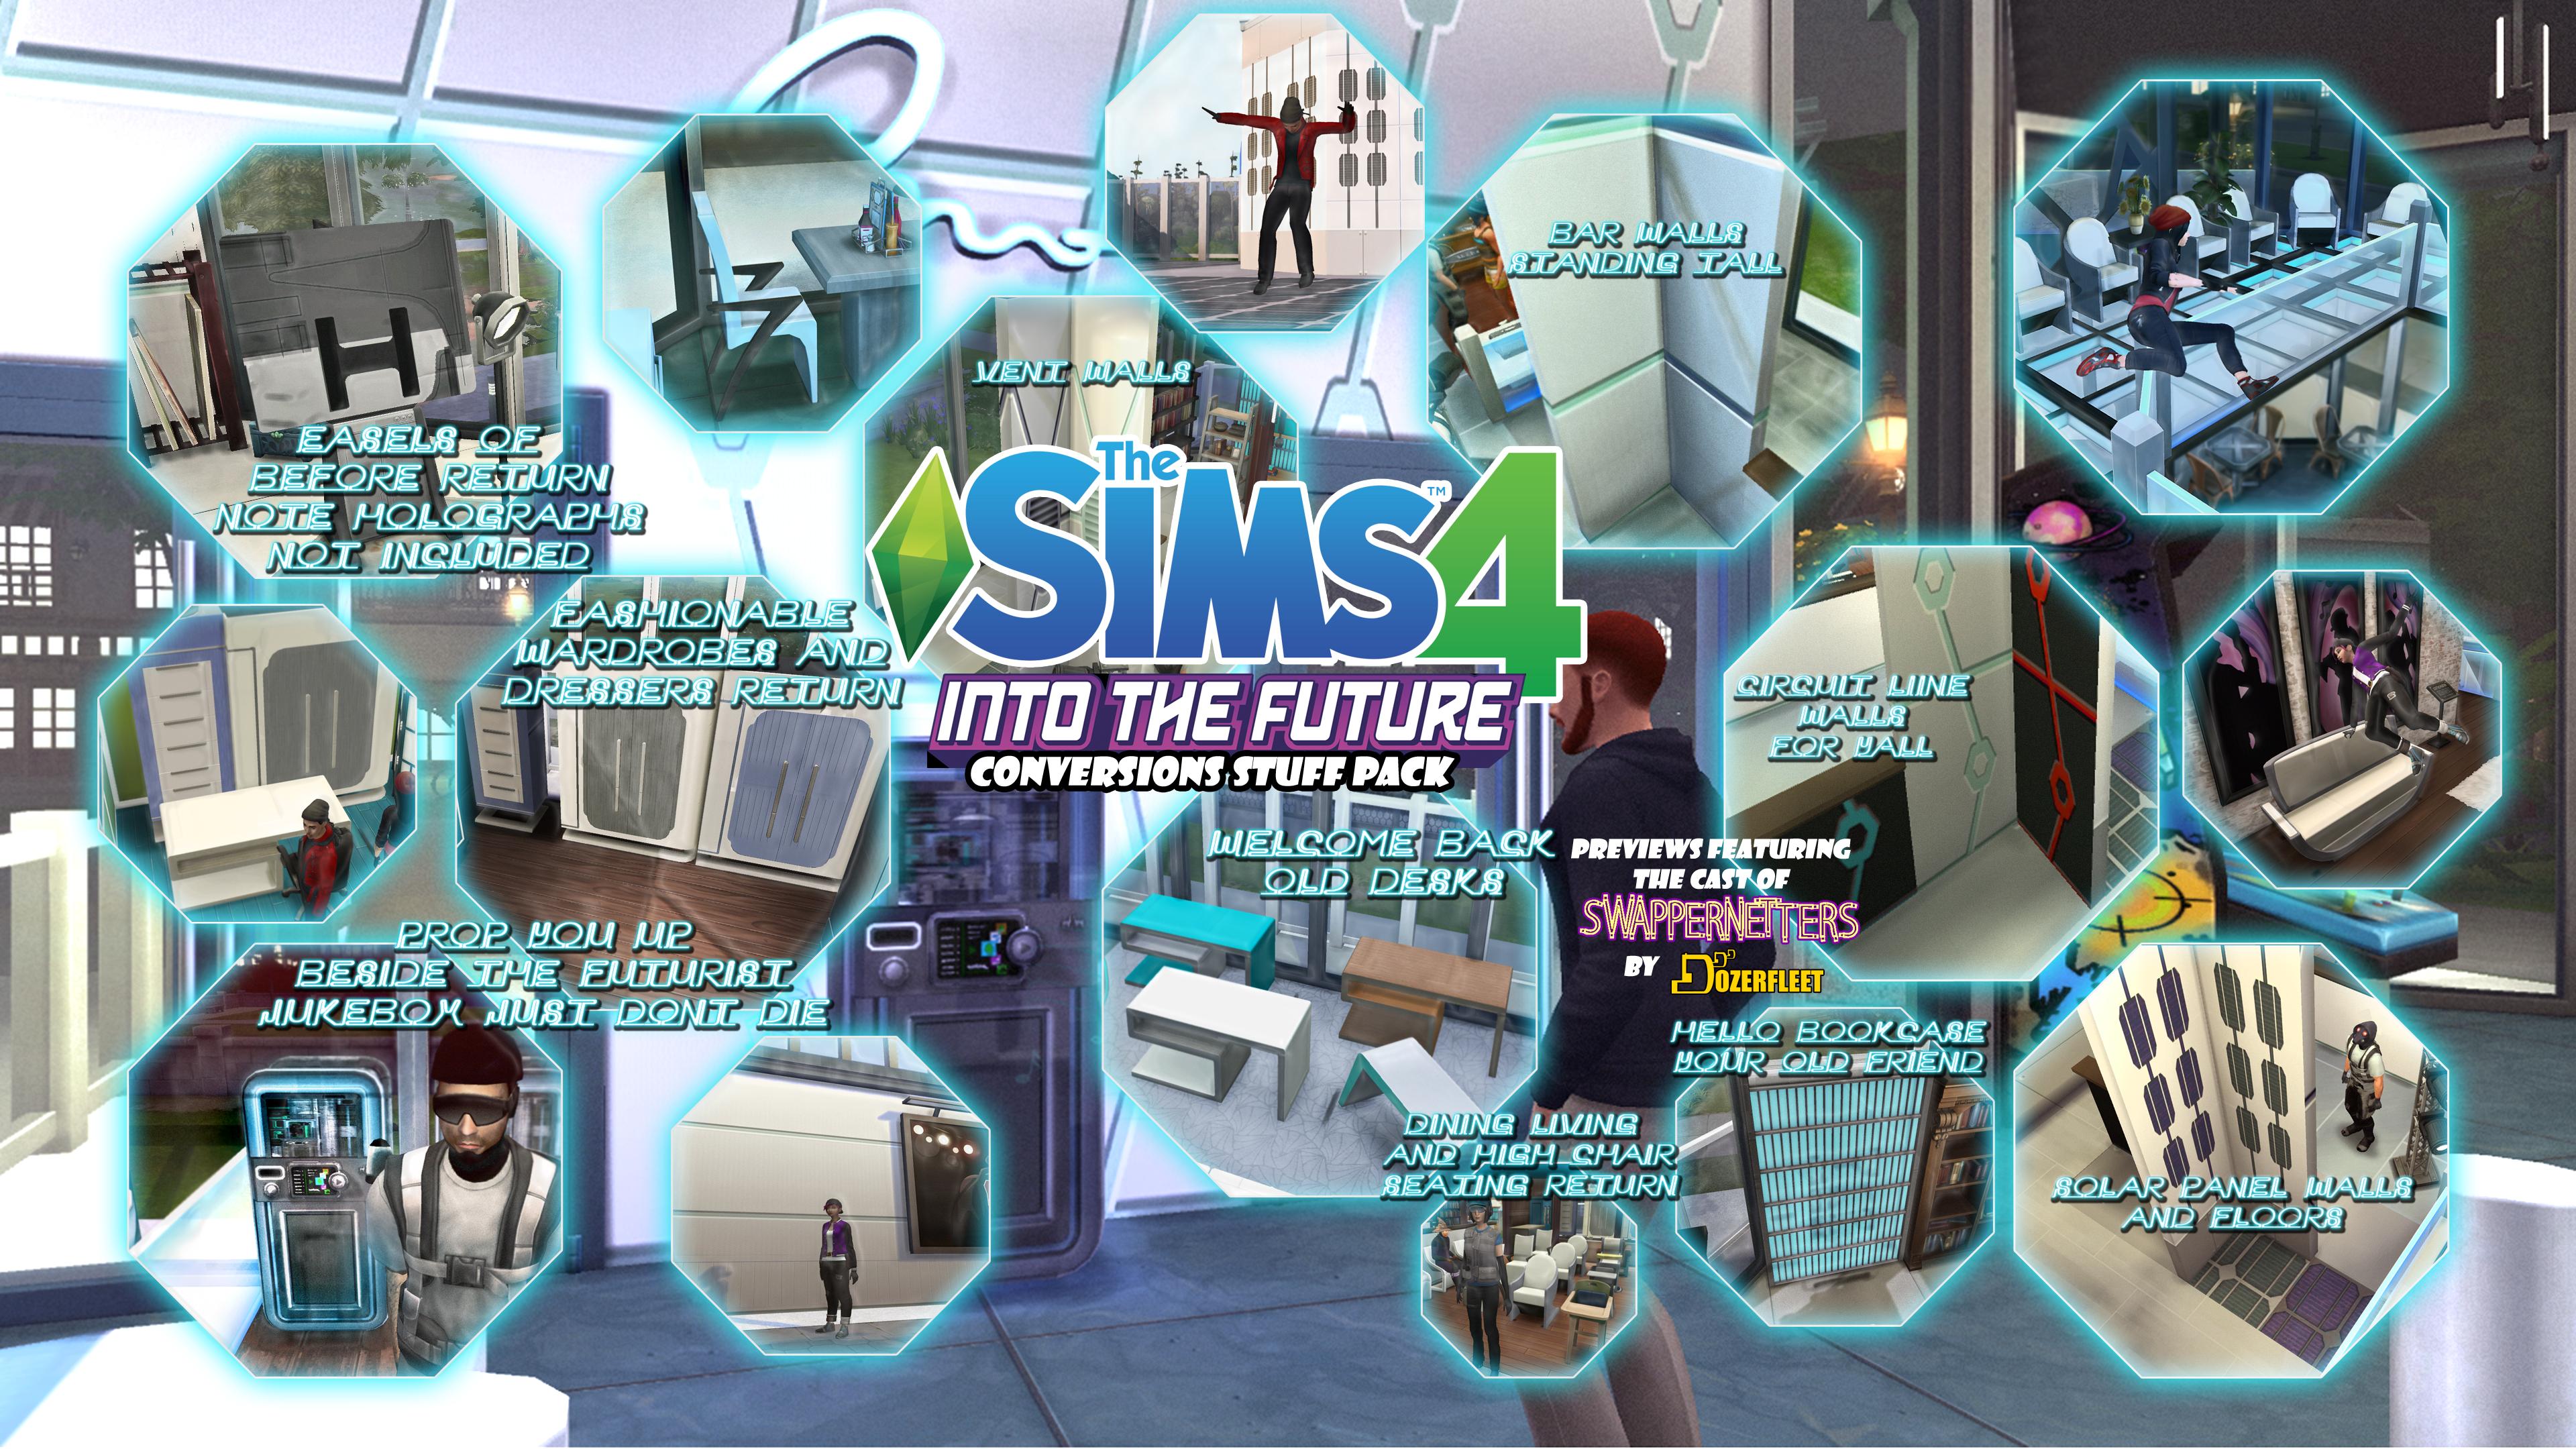 The Sims 4 Into the Future Conversions Stuff Pack by BulldozerIvan